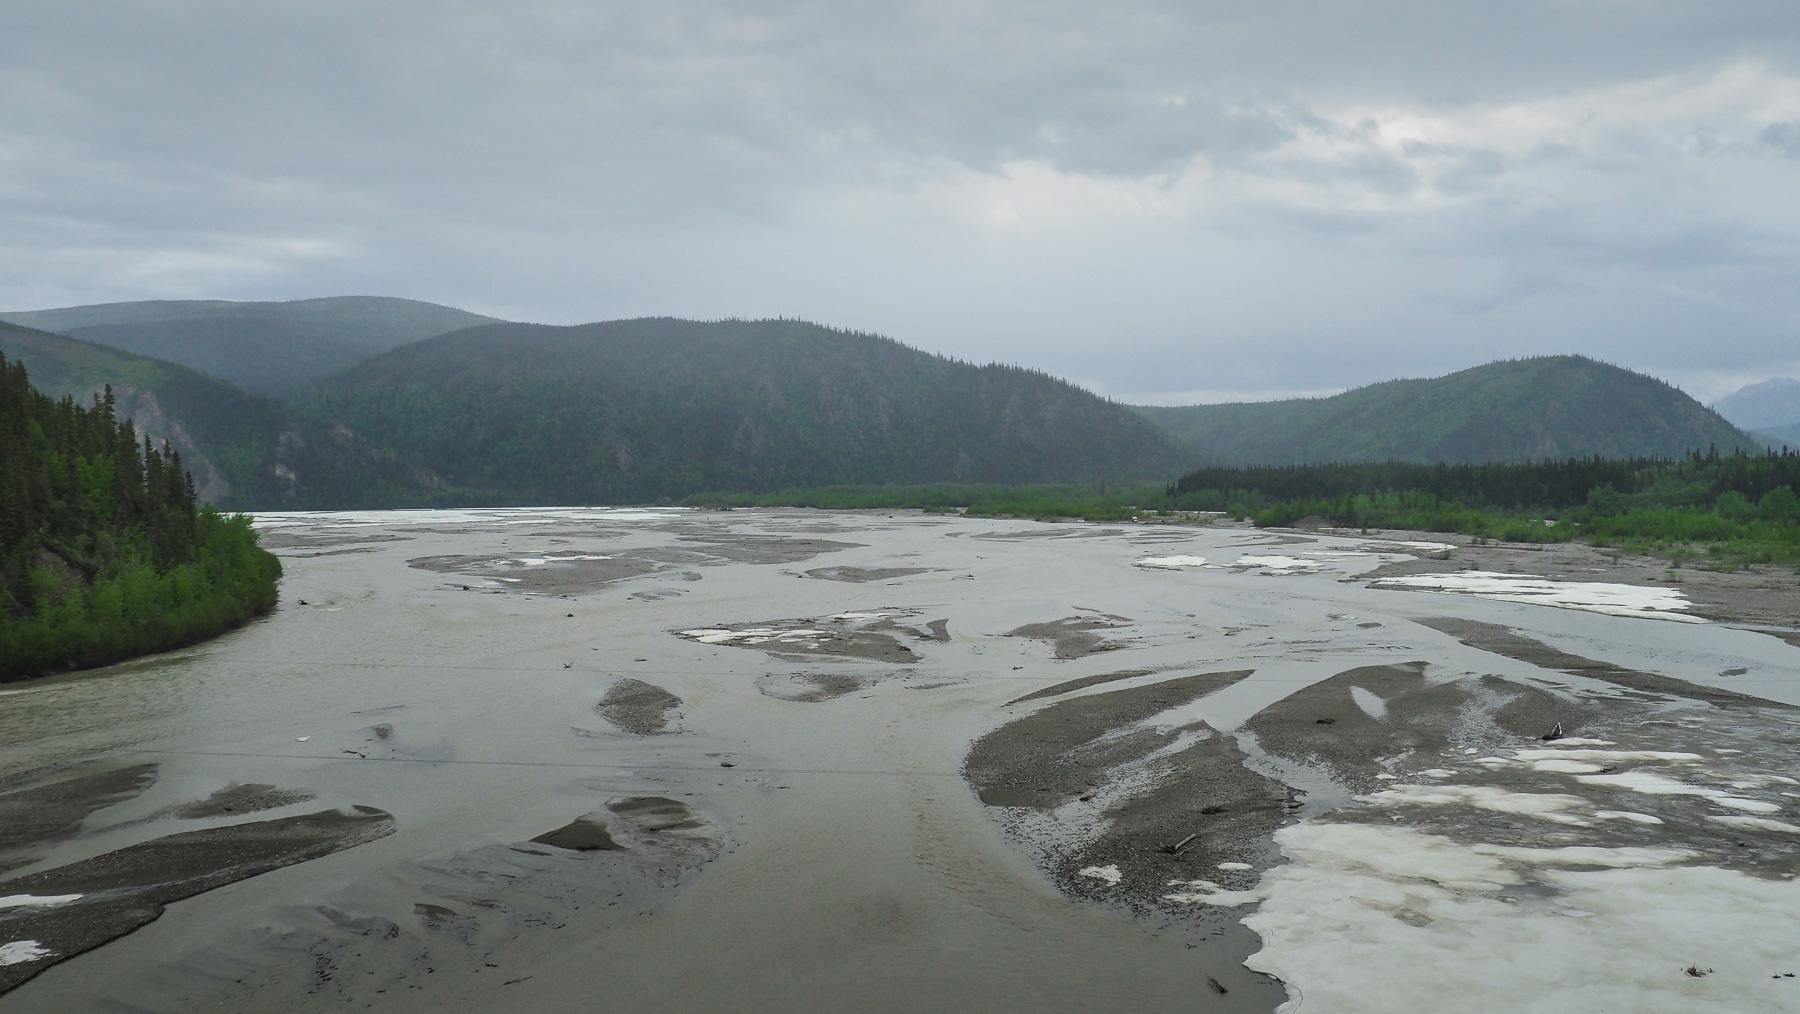 Alaska - die Flüsse hier haben etwas andere Dimensionen (Tanana river)